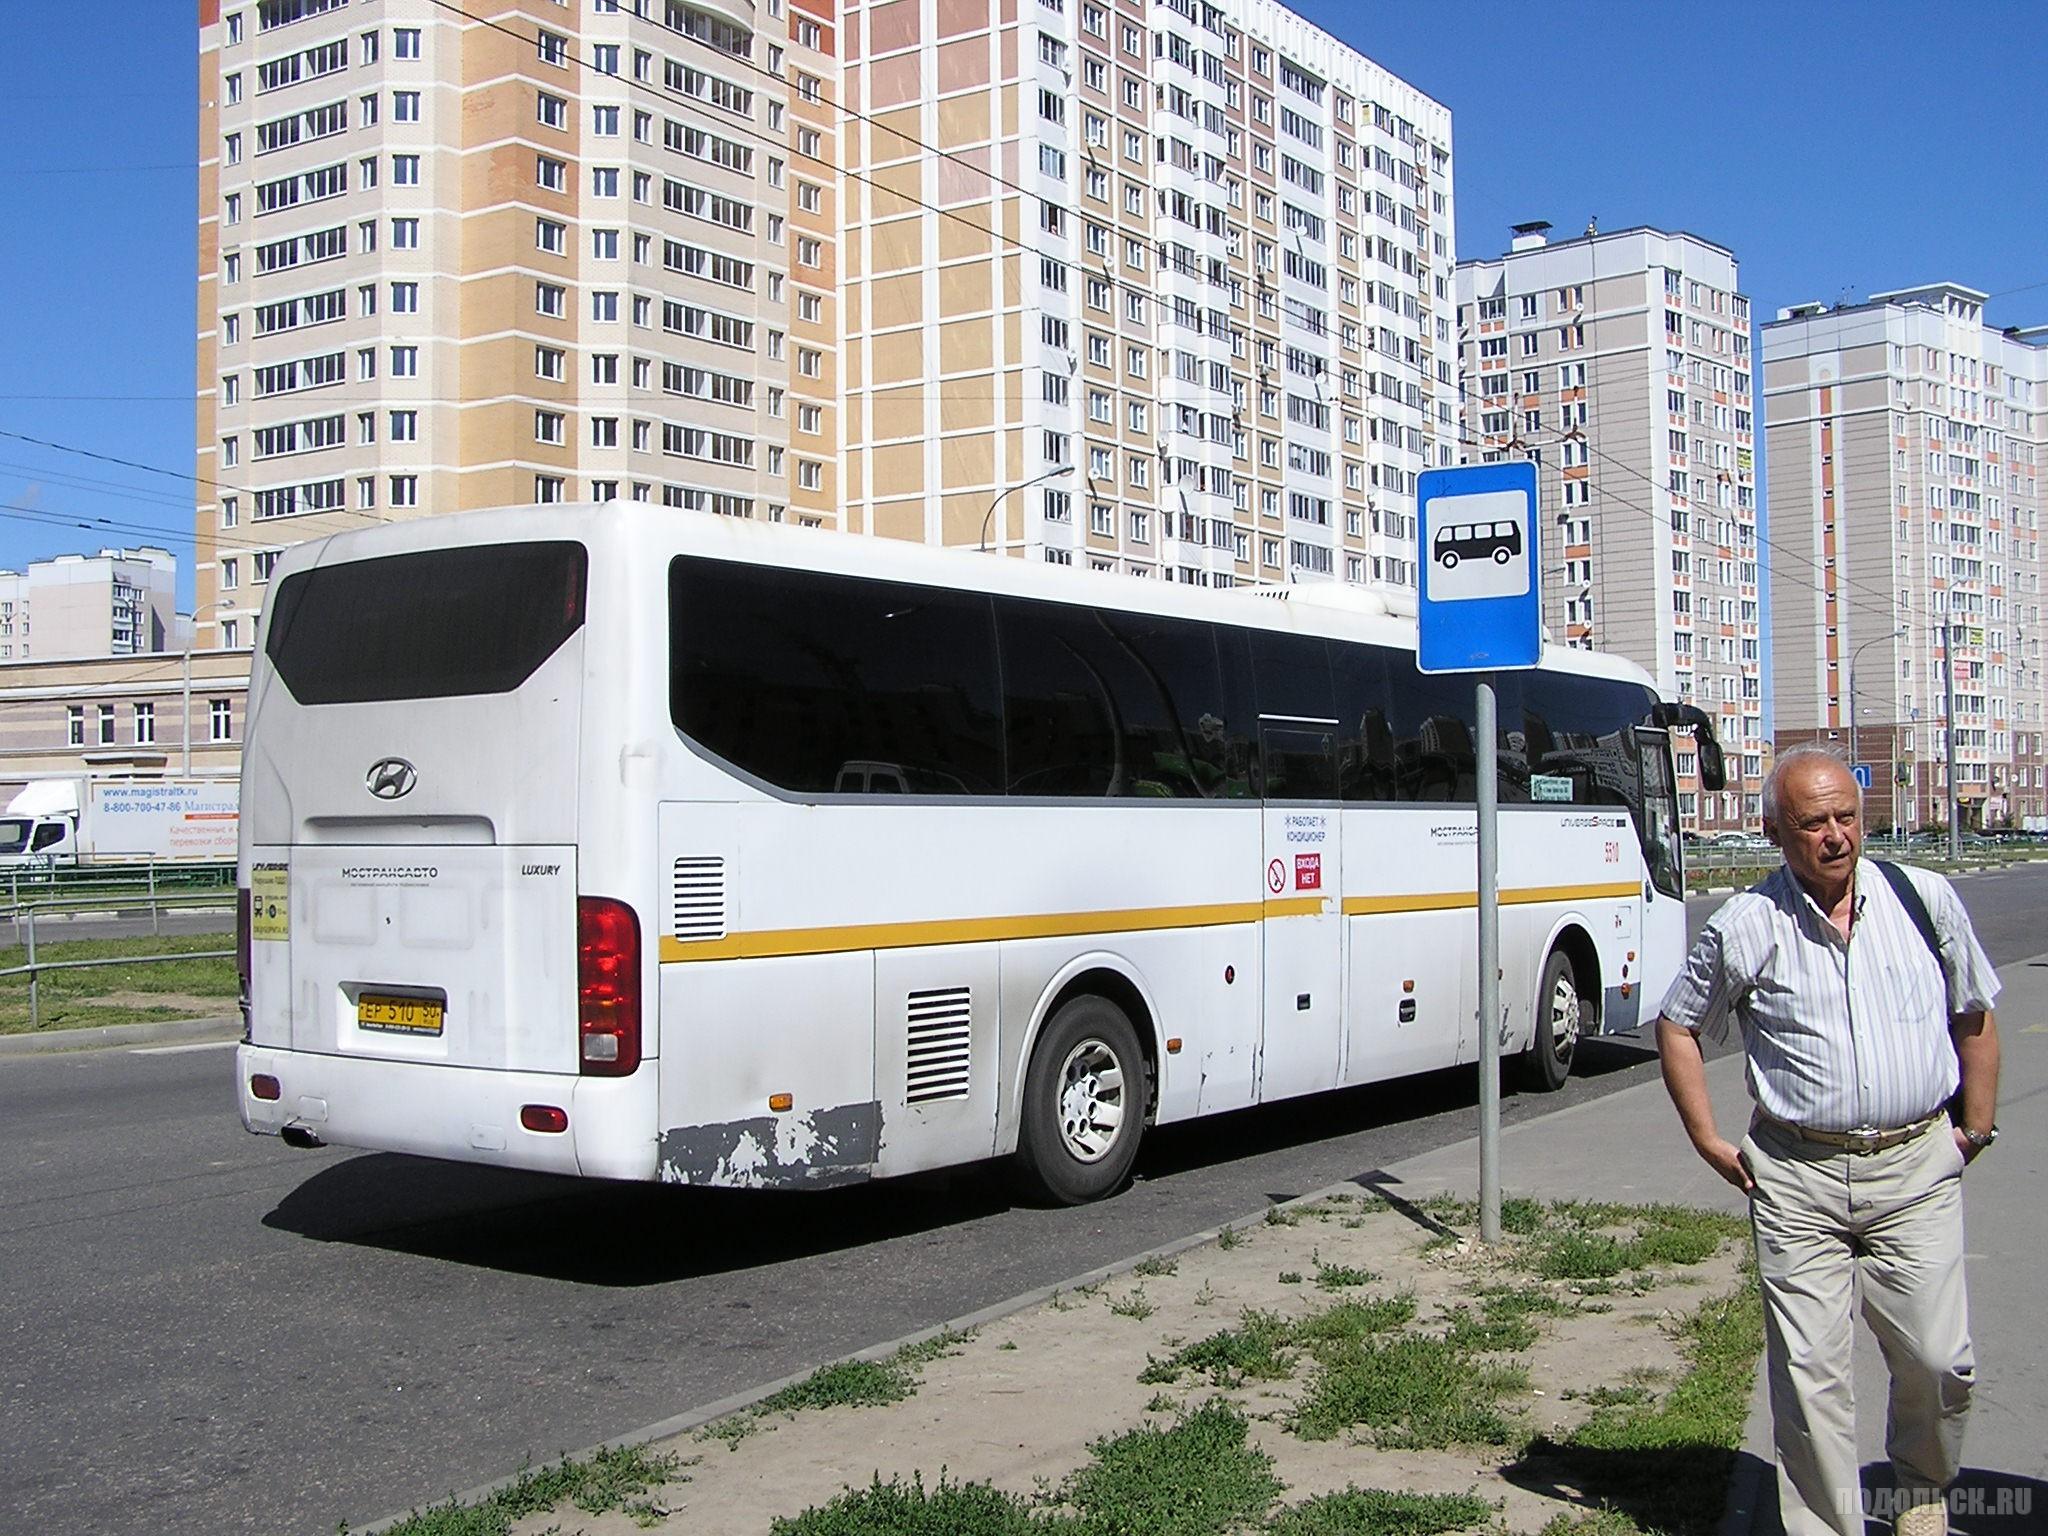 Остановка автобуса. 6 августа 2017.